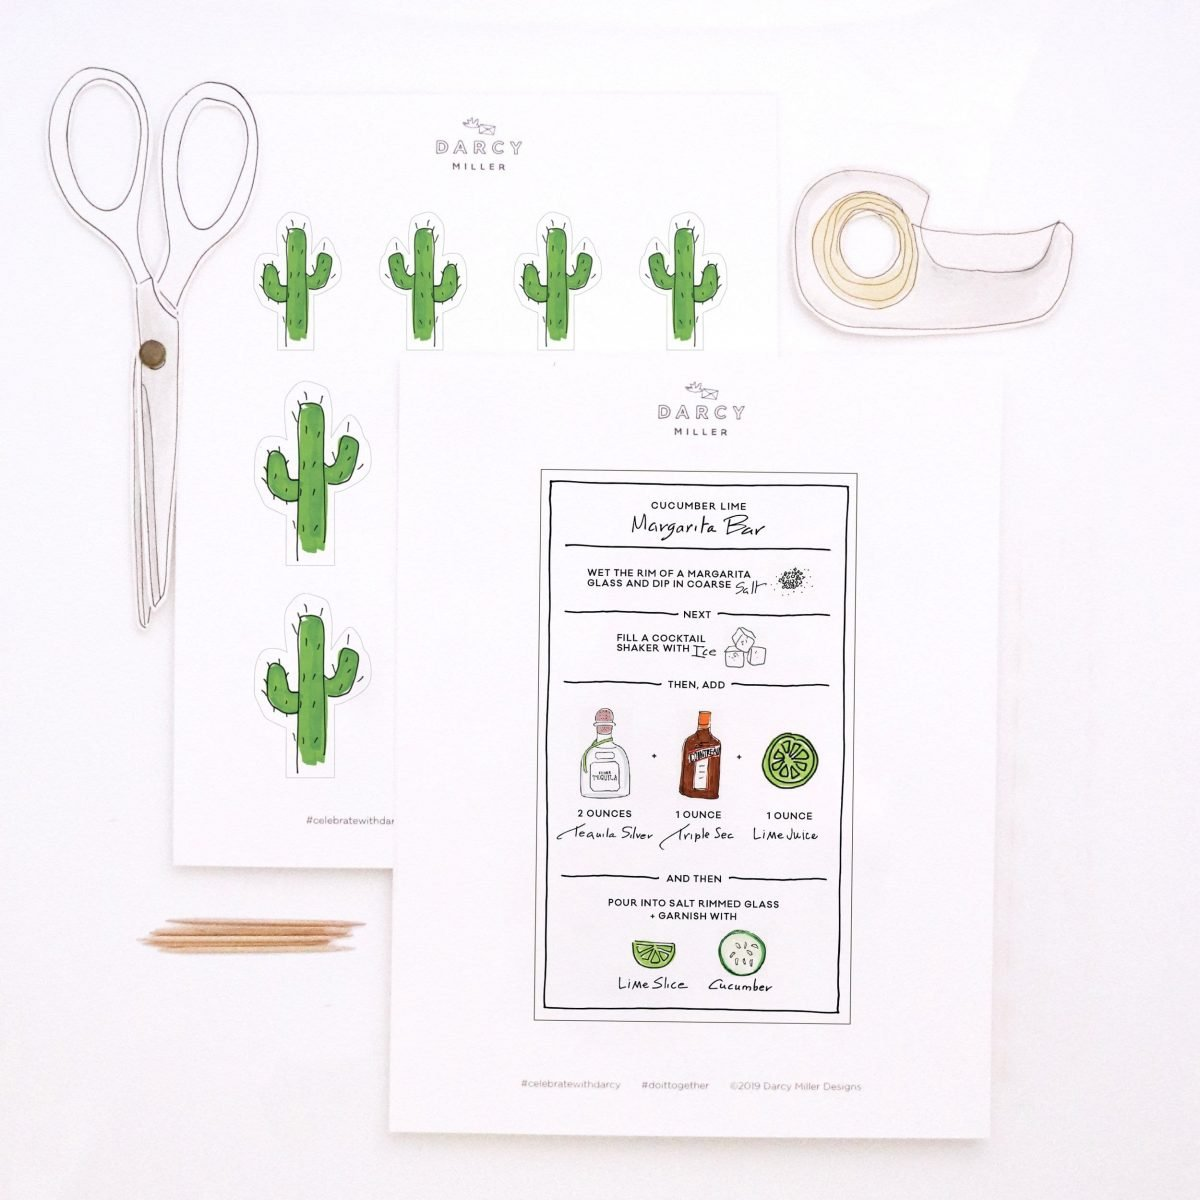 Darcy Miller Designs, Darcy Miller, margarita bar, party, food and drink